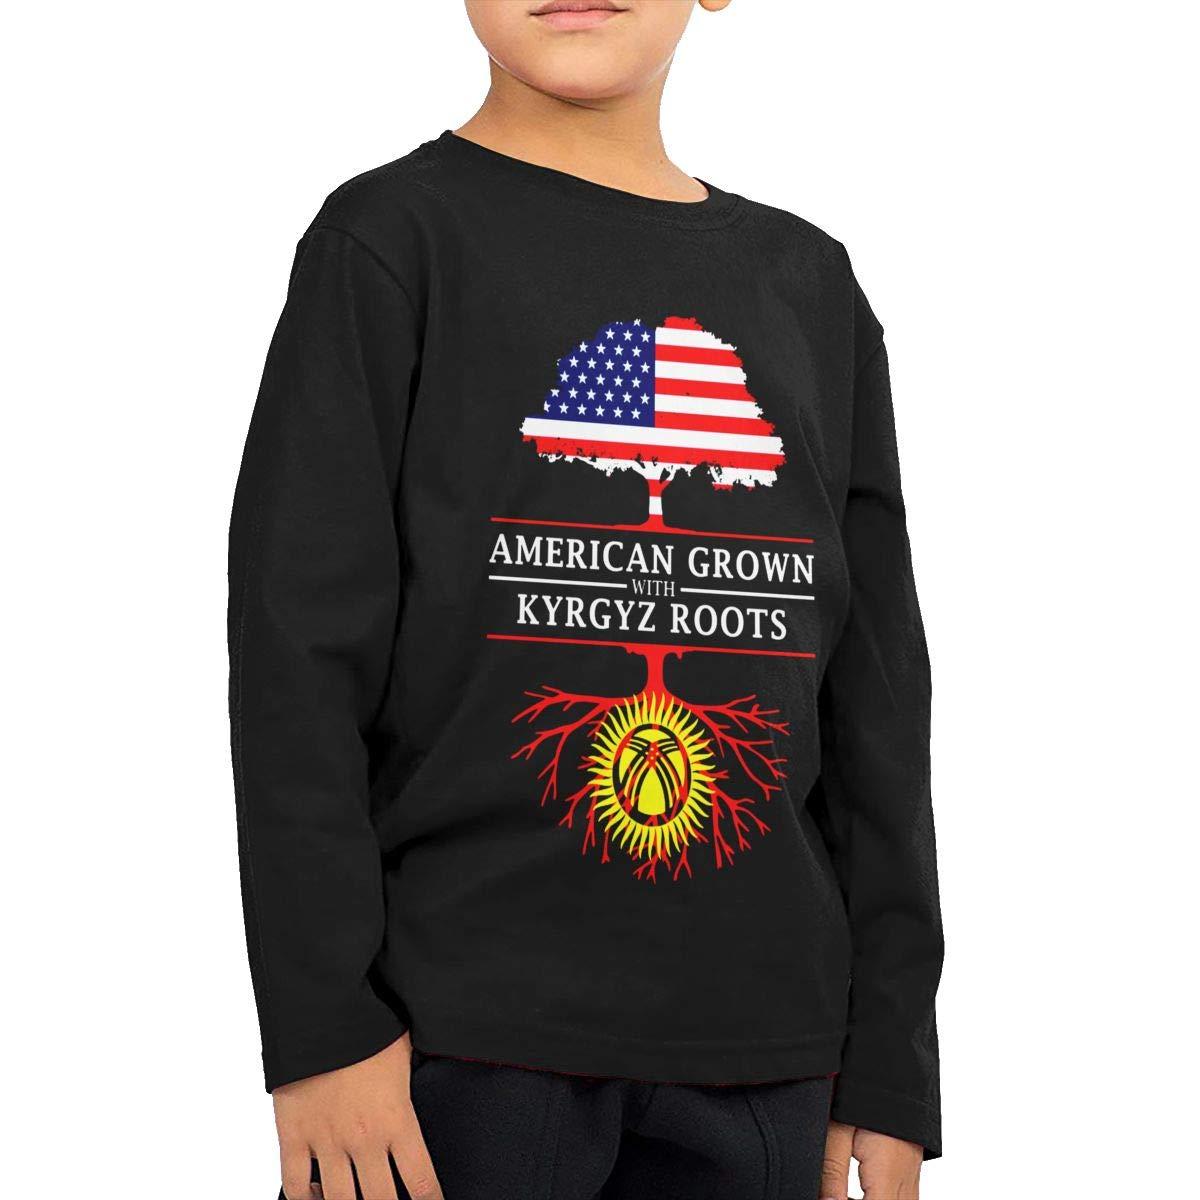 HADYKIDSLOVE American Grown with Kyrgyz Roots Kids T-Shirt Long Sleeve Boys Girls T-Shirt